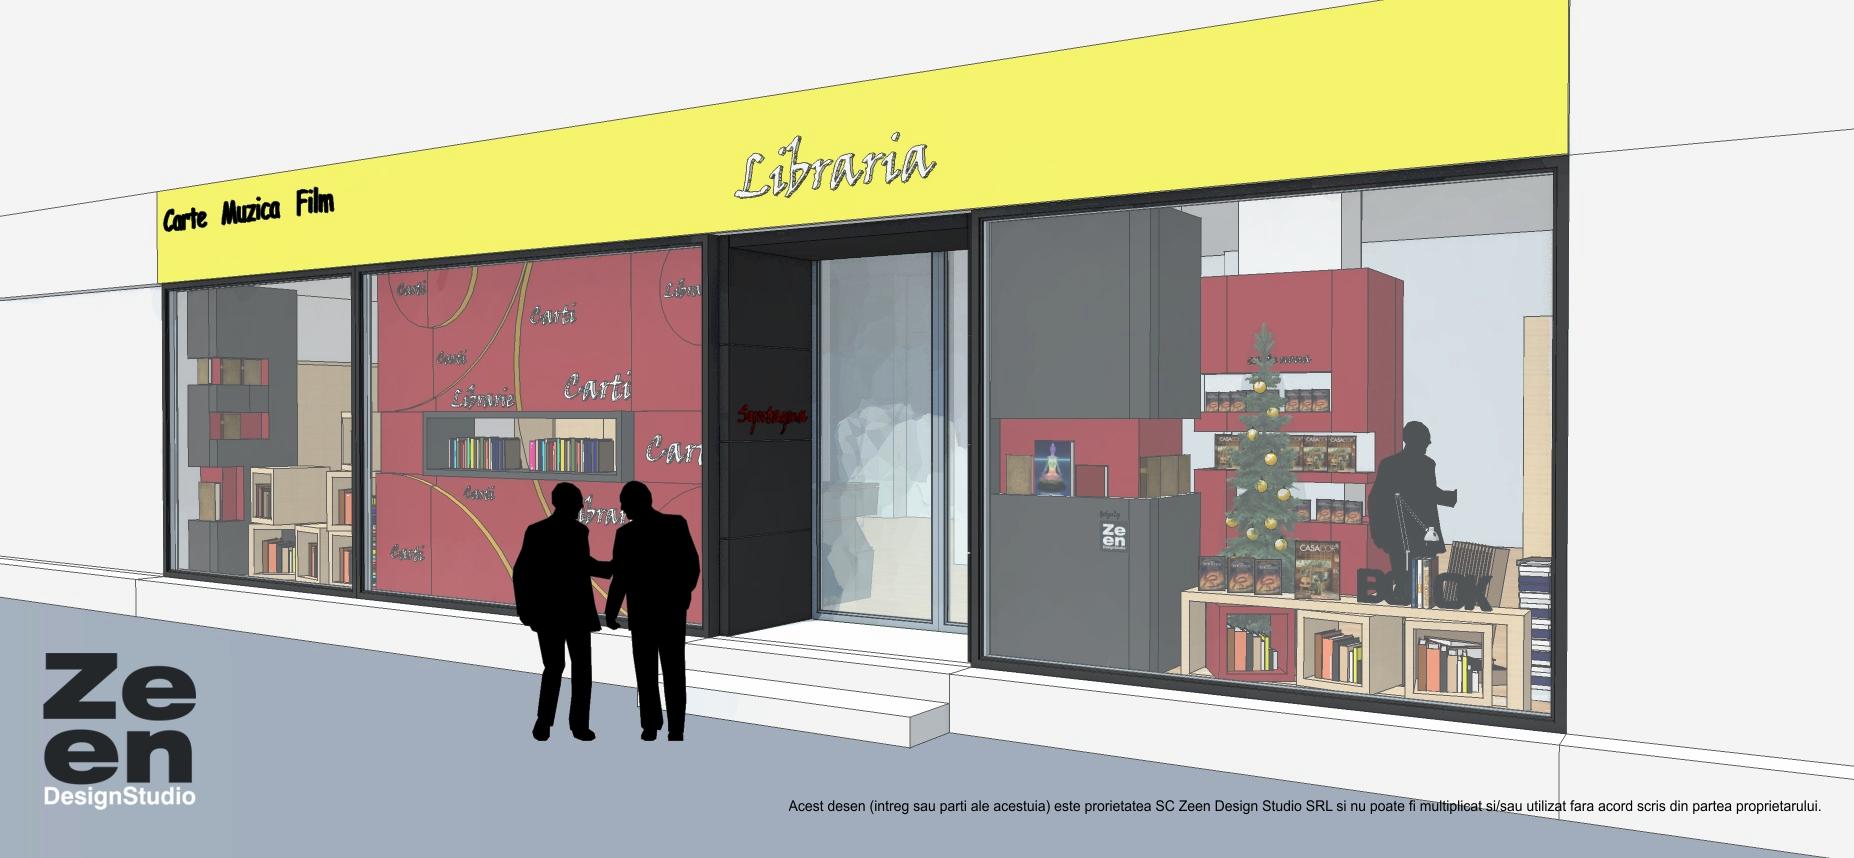 Amenajare apartament 2 camere zeen design studiozeen for Design apartment 2 camere